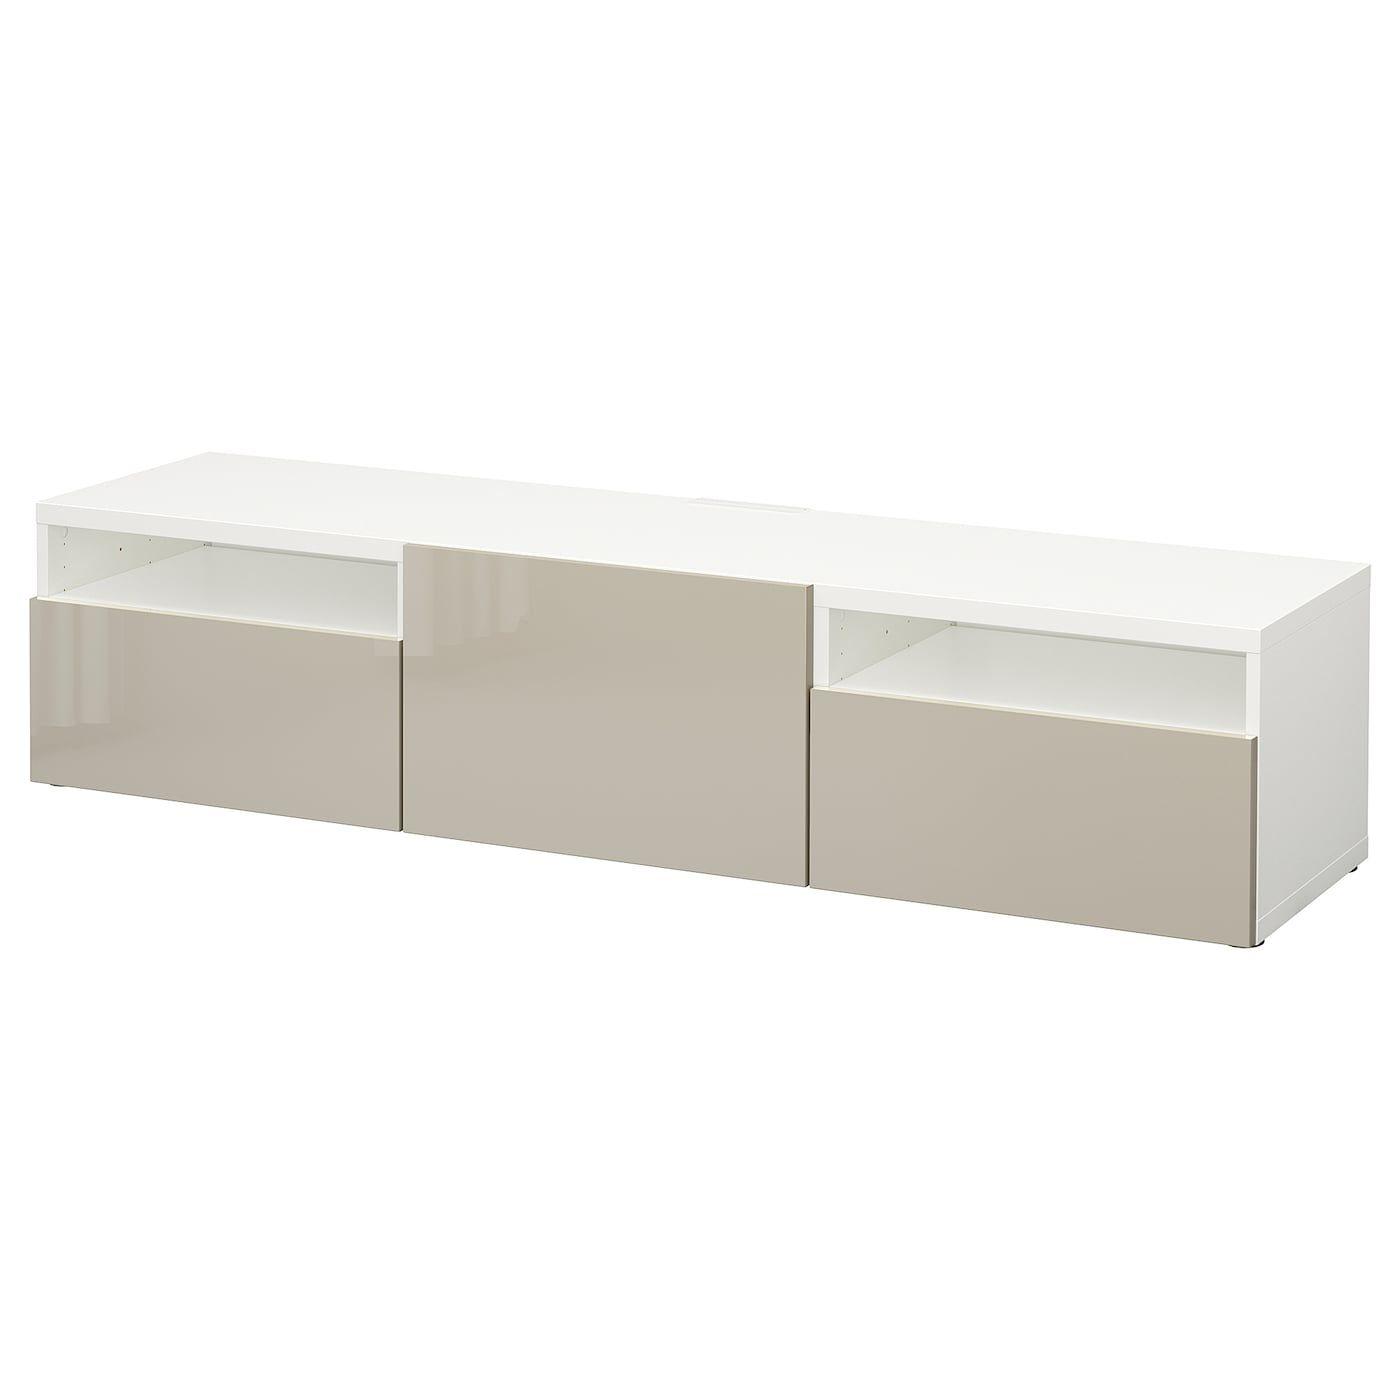 Ikea Besta Tv Unit White Selsviken High Gloss Beige In 2020 Tv Bench Tv Unit Ikea